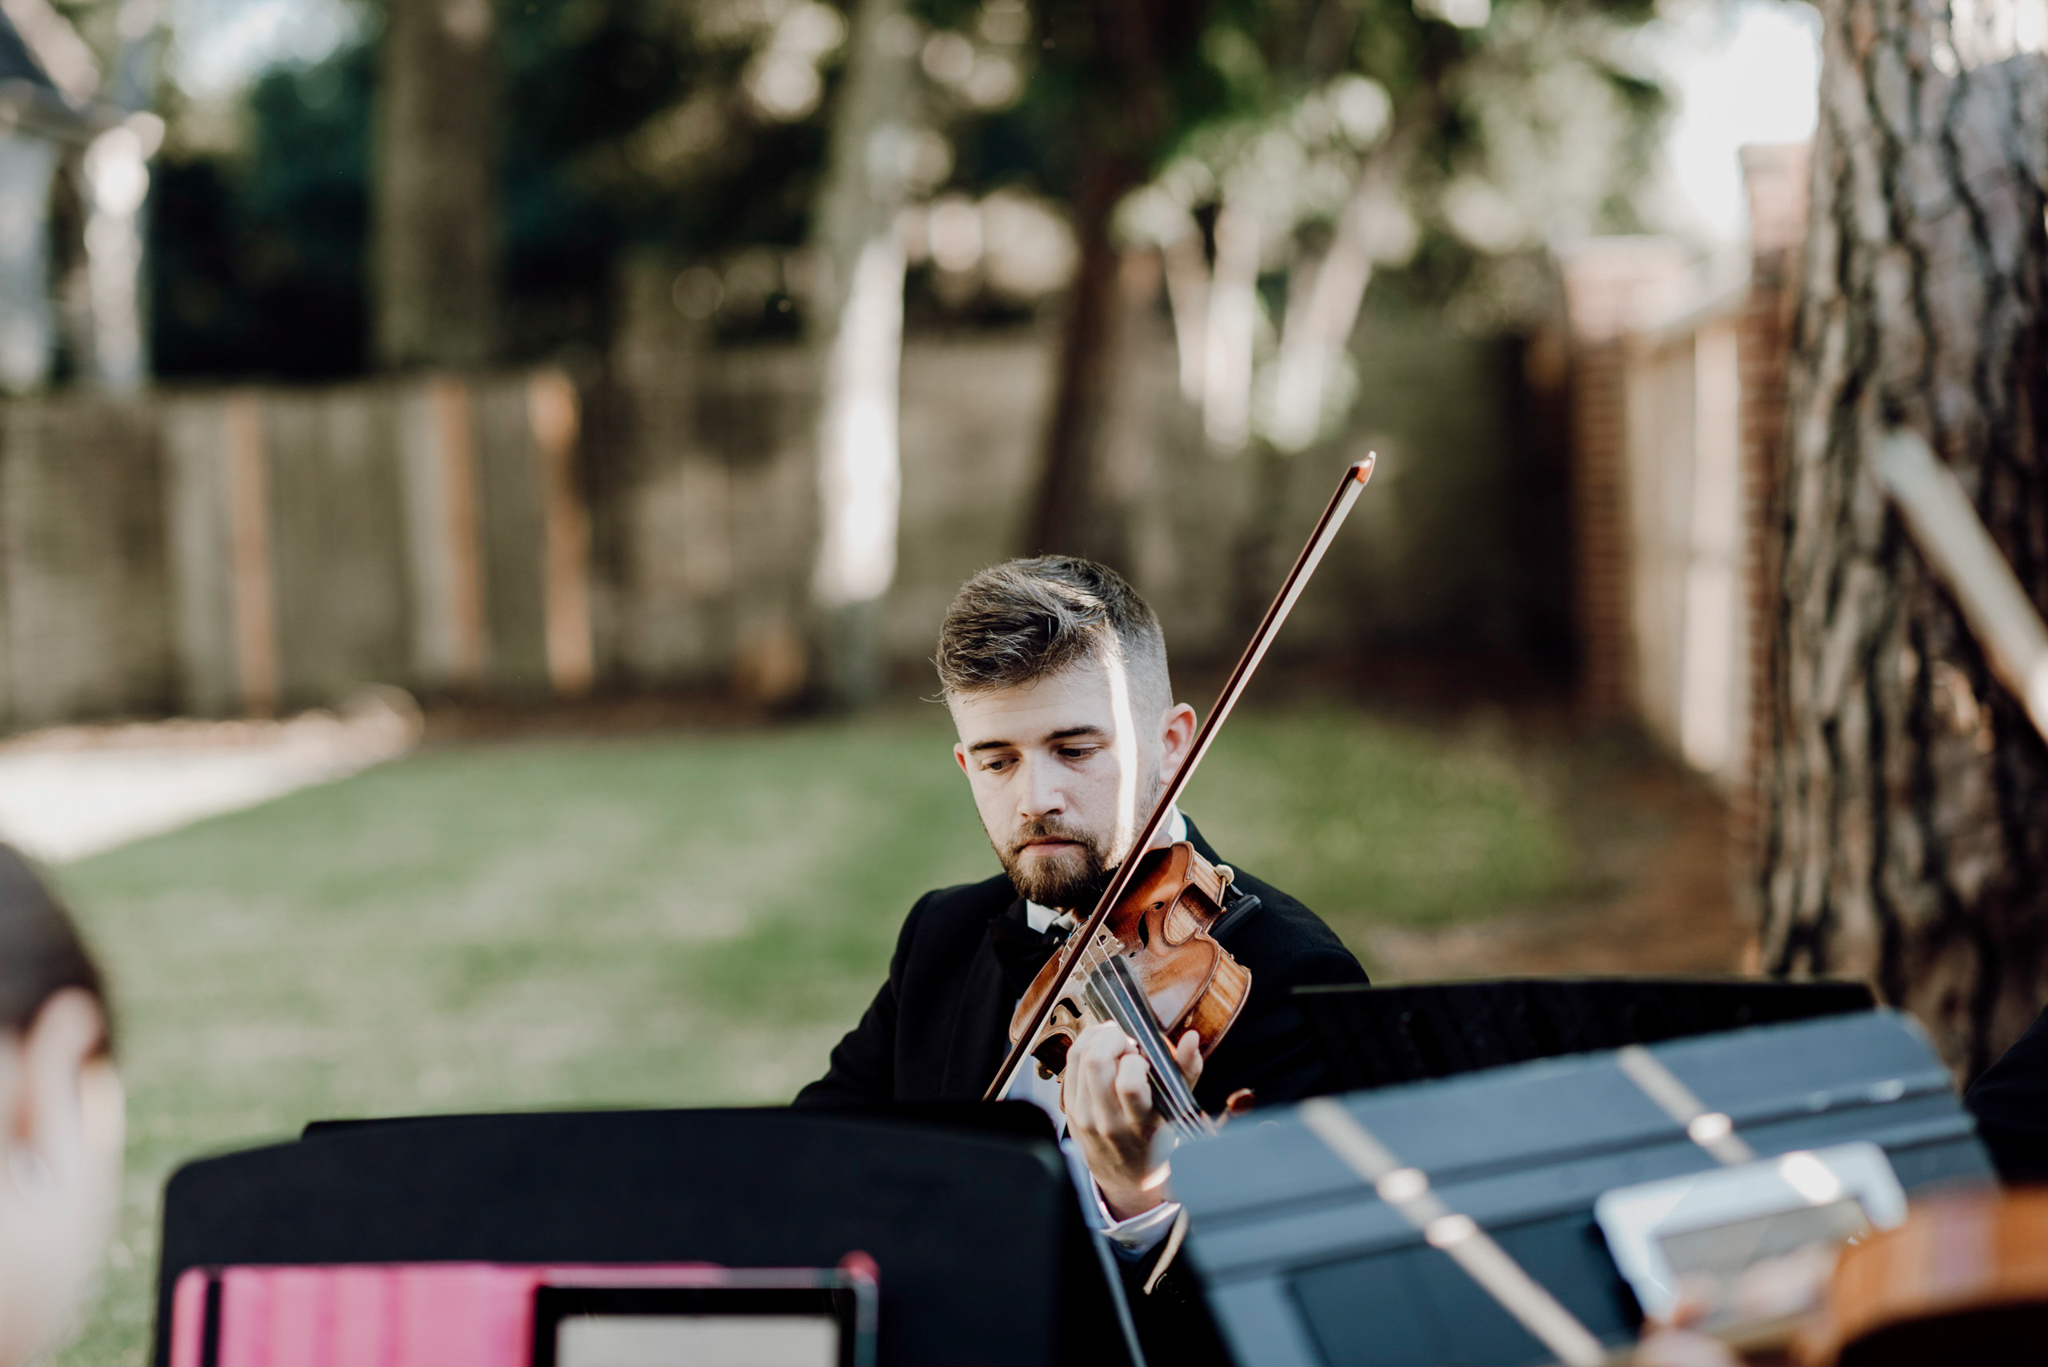 Houston Wedding Photographer-Intimate Texas Backyard Wedding- Houston Wedding Photographer -Kristen Giles Photography-32.jpg